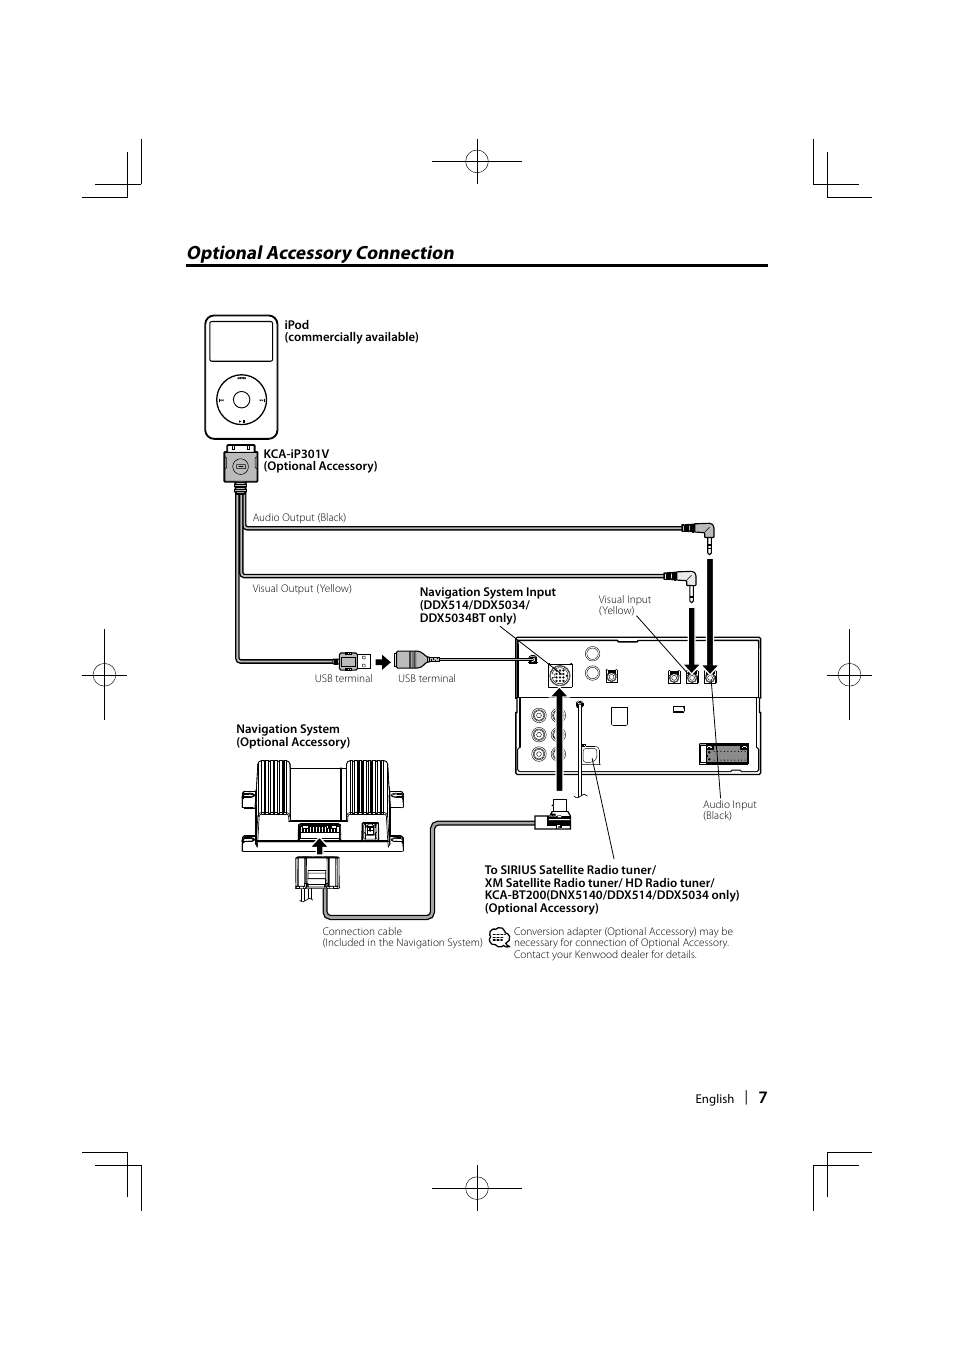 Optional accessory connection | Kenwood DDX5034 User Manual ... on kenwood ddx512 wiring diagram, kenwood kdc-x794 wiring diagram, kenwood ddx516 wiring diagram, kenwood ddx7019 wiring diagram, kenwood kvt-512 wiring diagram, kenwood kdc-mp442u wiring diagram, kenwood ddx418 wiring diagram, kenwood kvt-514 wiring diagram, kenwood dnx5120 wiring diagram, kenwood kdc-mp342u wiring diagram, kenwood ddx6019 wiring diagram, kenwood dnx7140 wiring diagram, kenwood ddx712 wiring diagram, kenwood kdc-hd545u wiring diagram, kenwood ddx wiring diagram, kenwood ddx419 wiring diagram, kenwood dnx7100 wiring diagram,